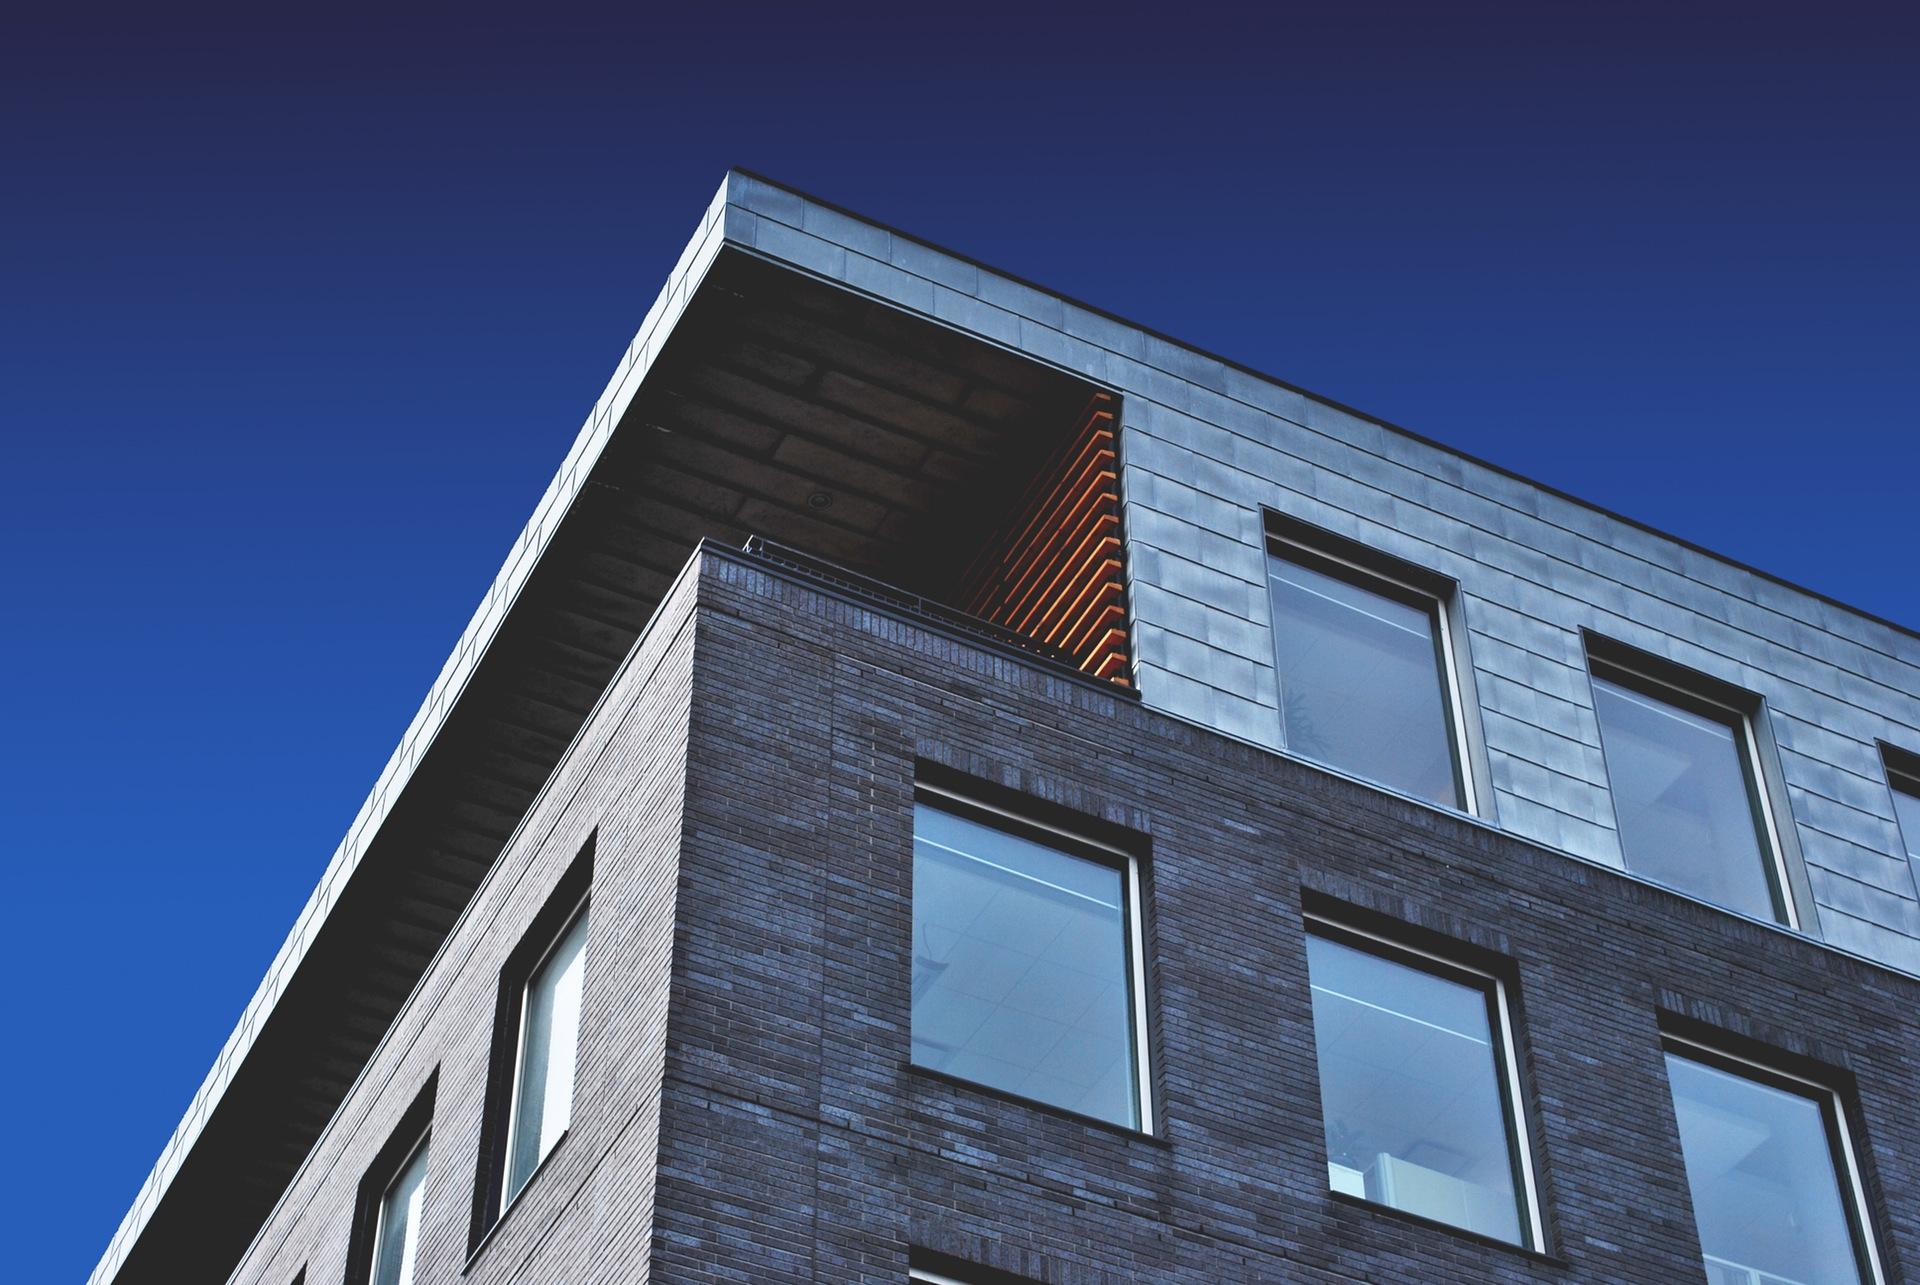 Loft - Commercial Radon Testing